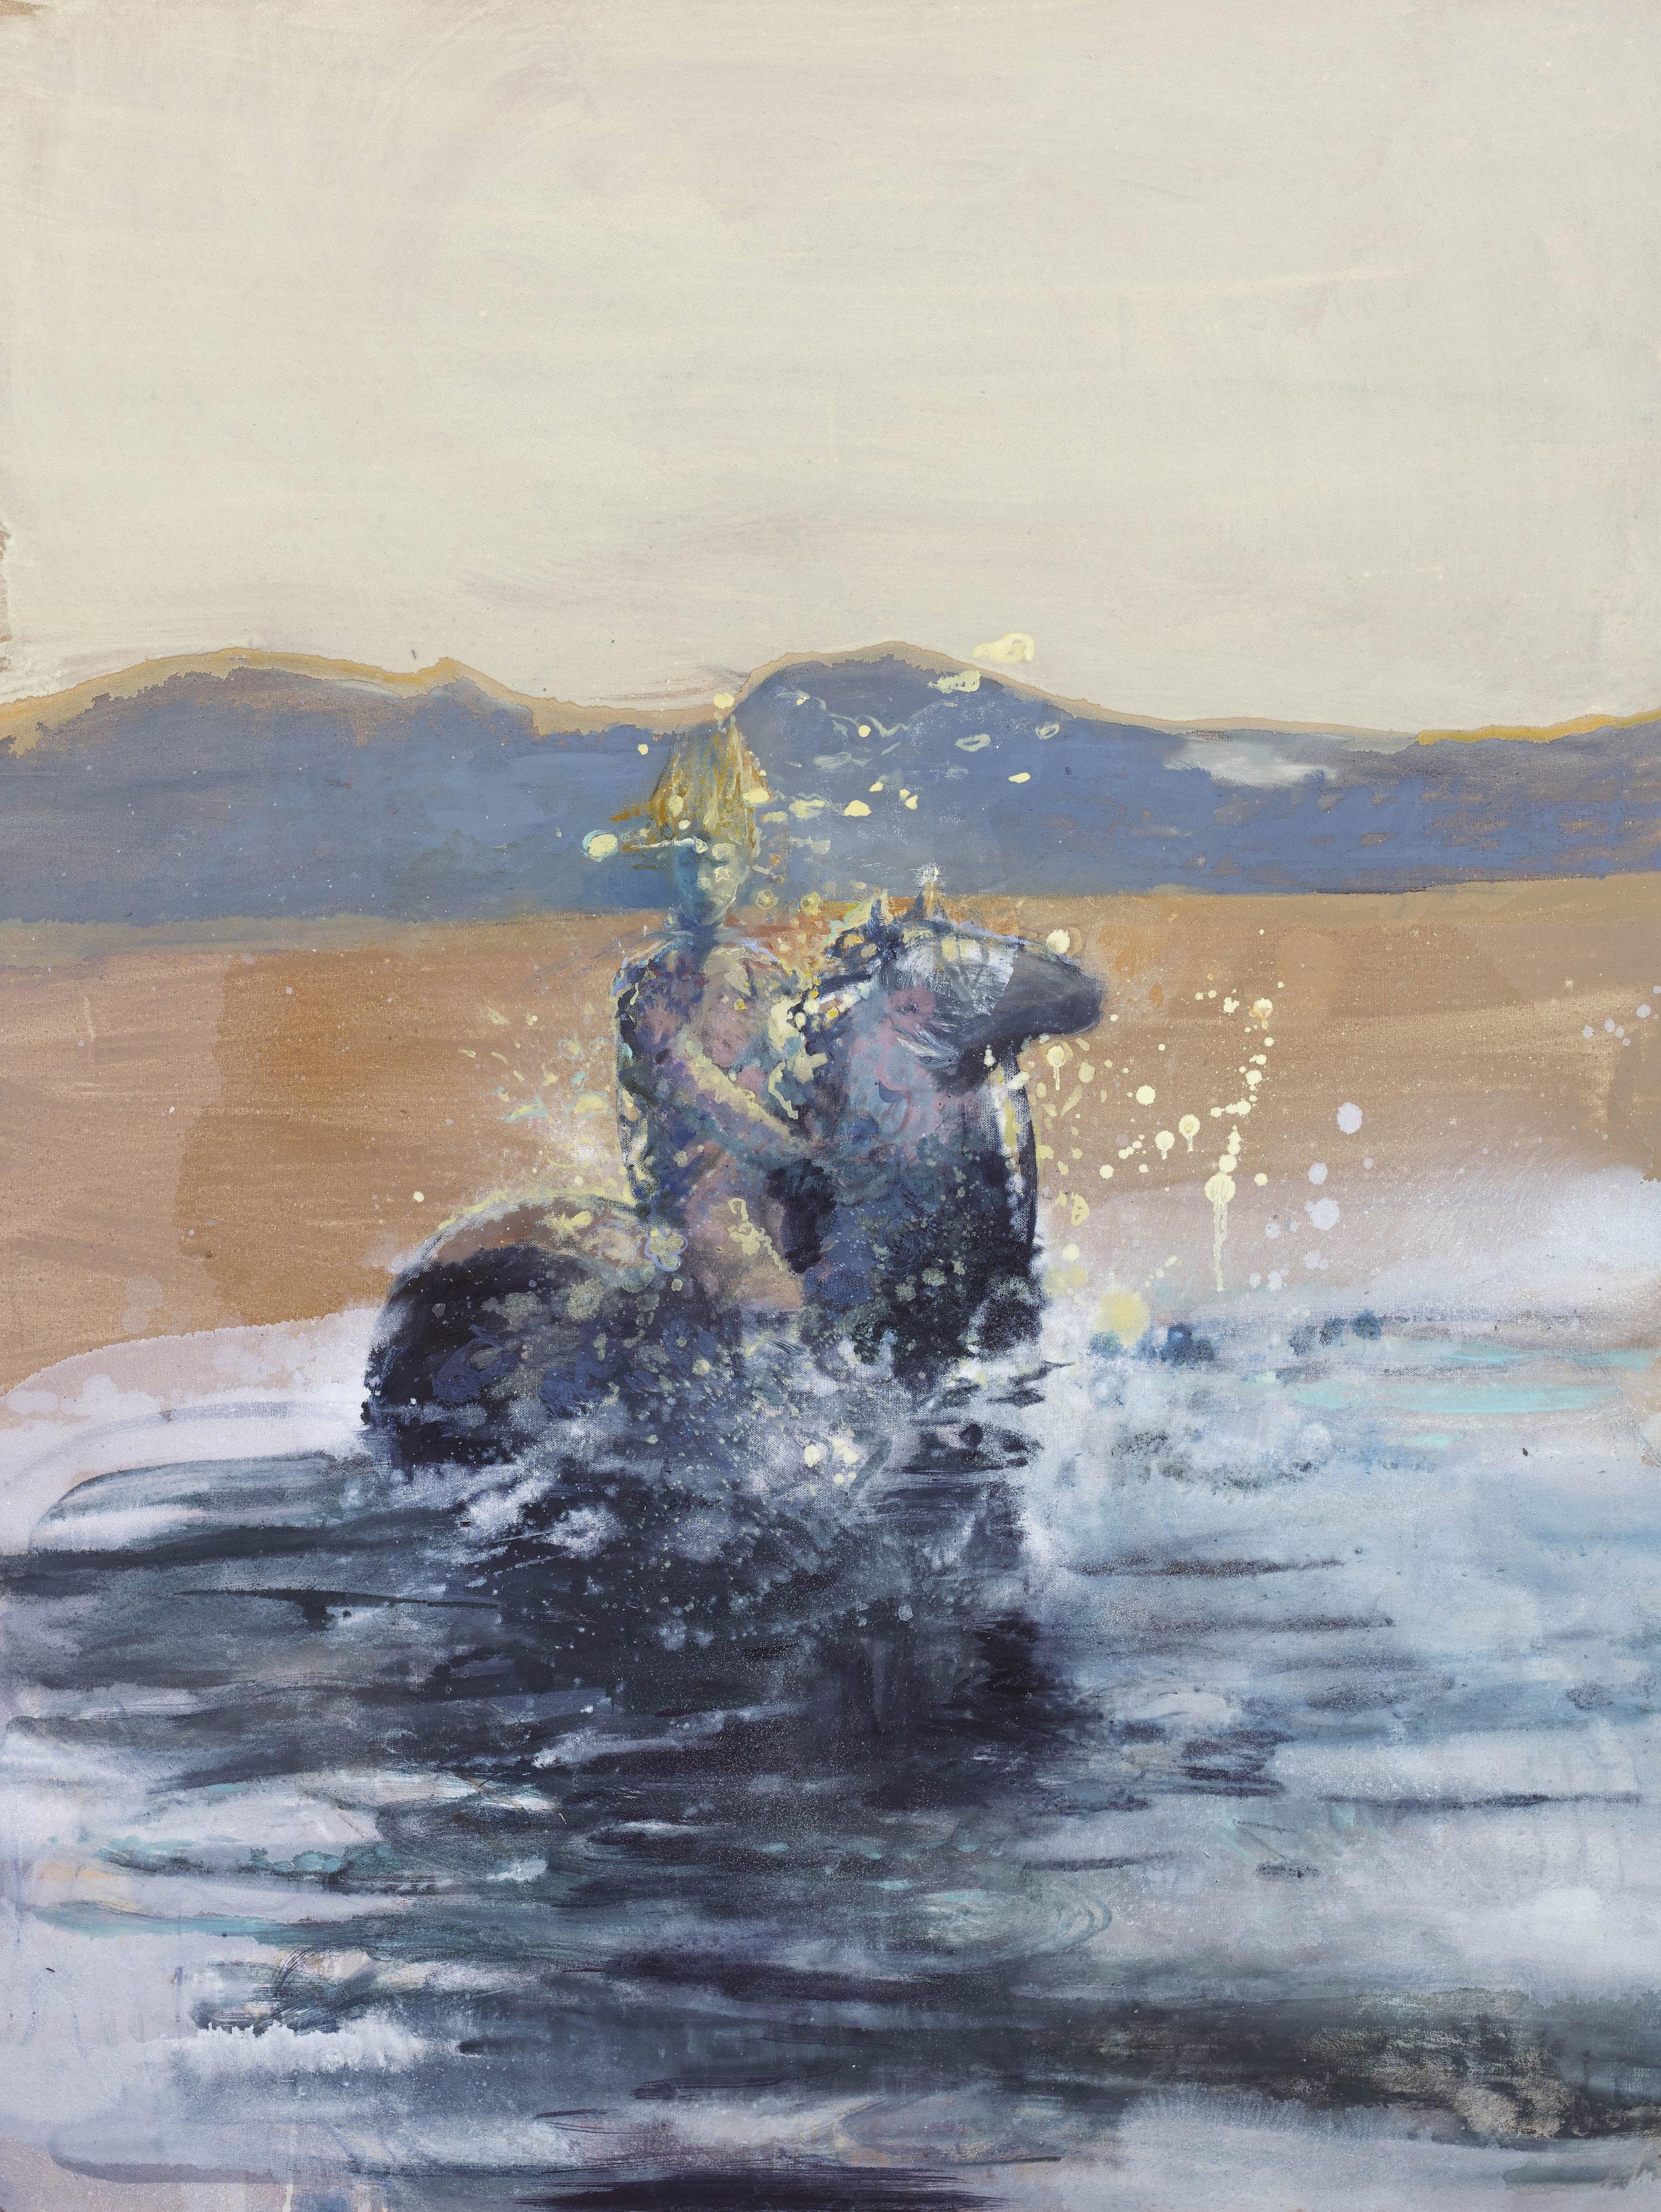 'Phantom Rider' oil & pigment on linen 121 x 90 cms